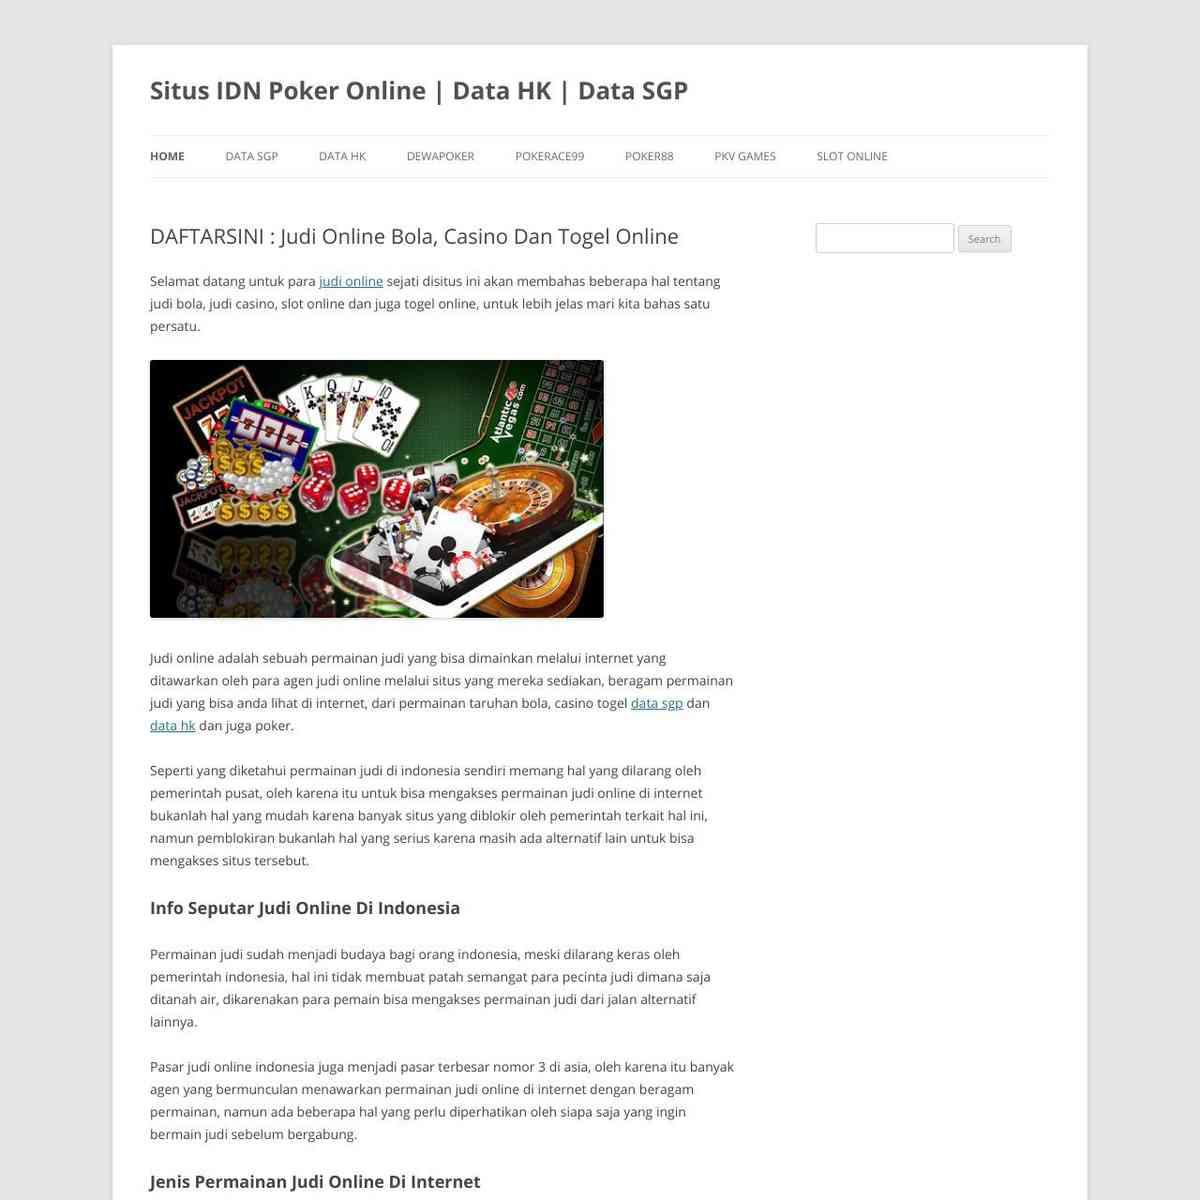 DAFTARSINI : Judi Online Bola, Casino Dan Togel Online